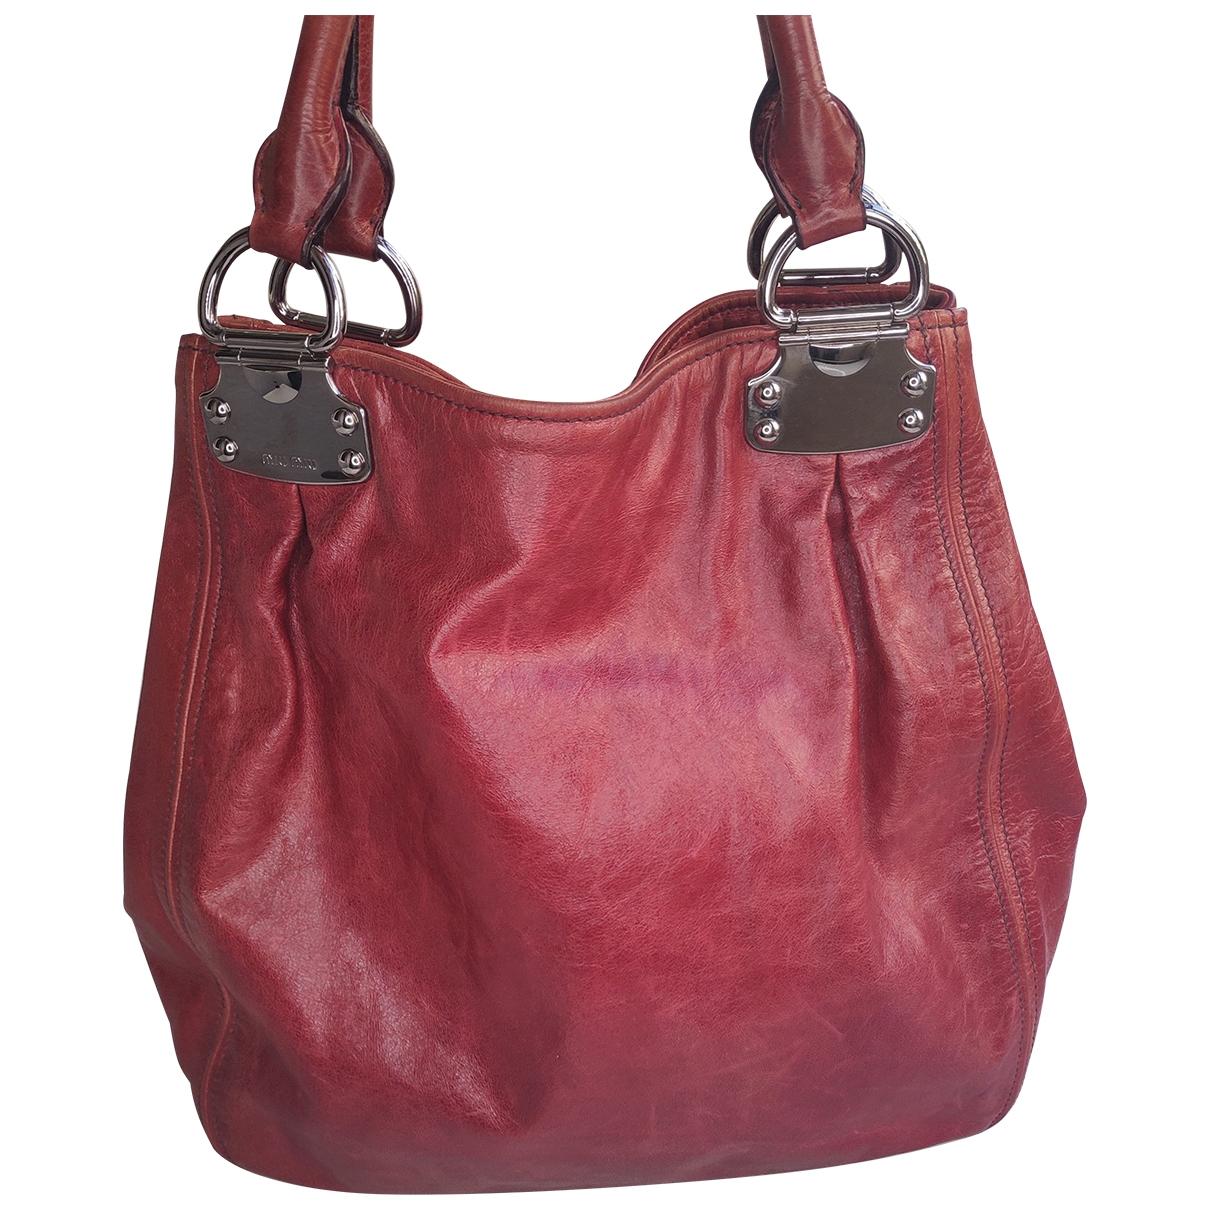 Miu Miu \N Red Leather handbag for Women \N